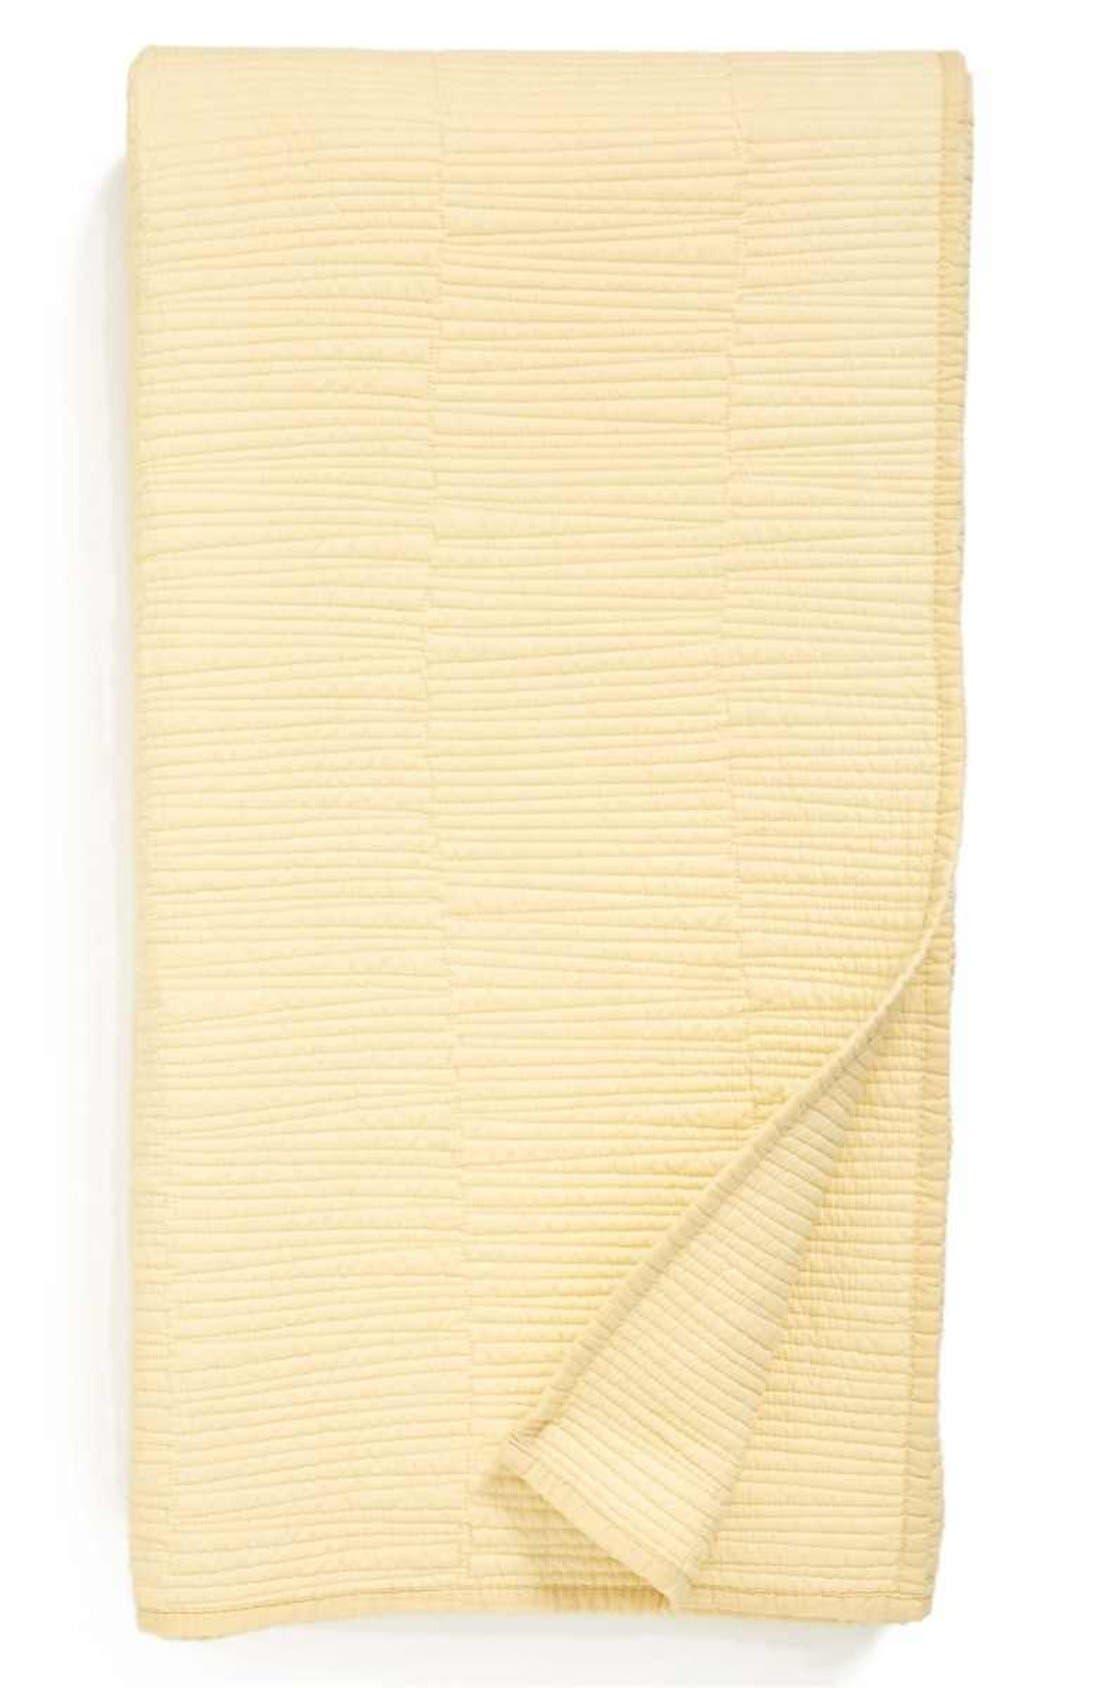 Alternate Image 1 Selected - Donna Karan 'Atmosphere' Cotton Quilt (Online Only)